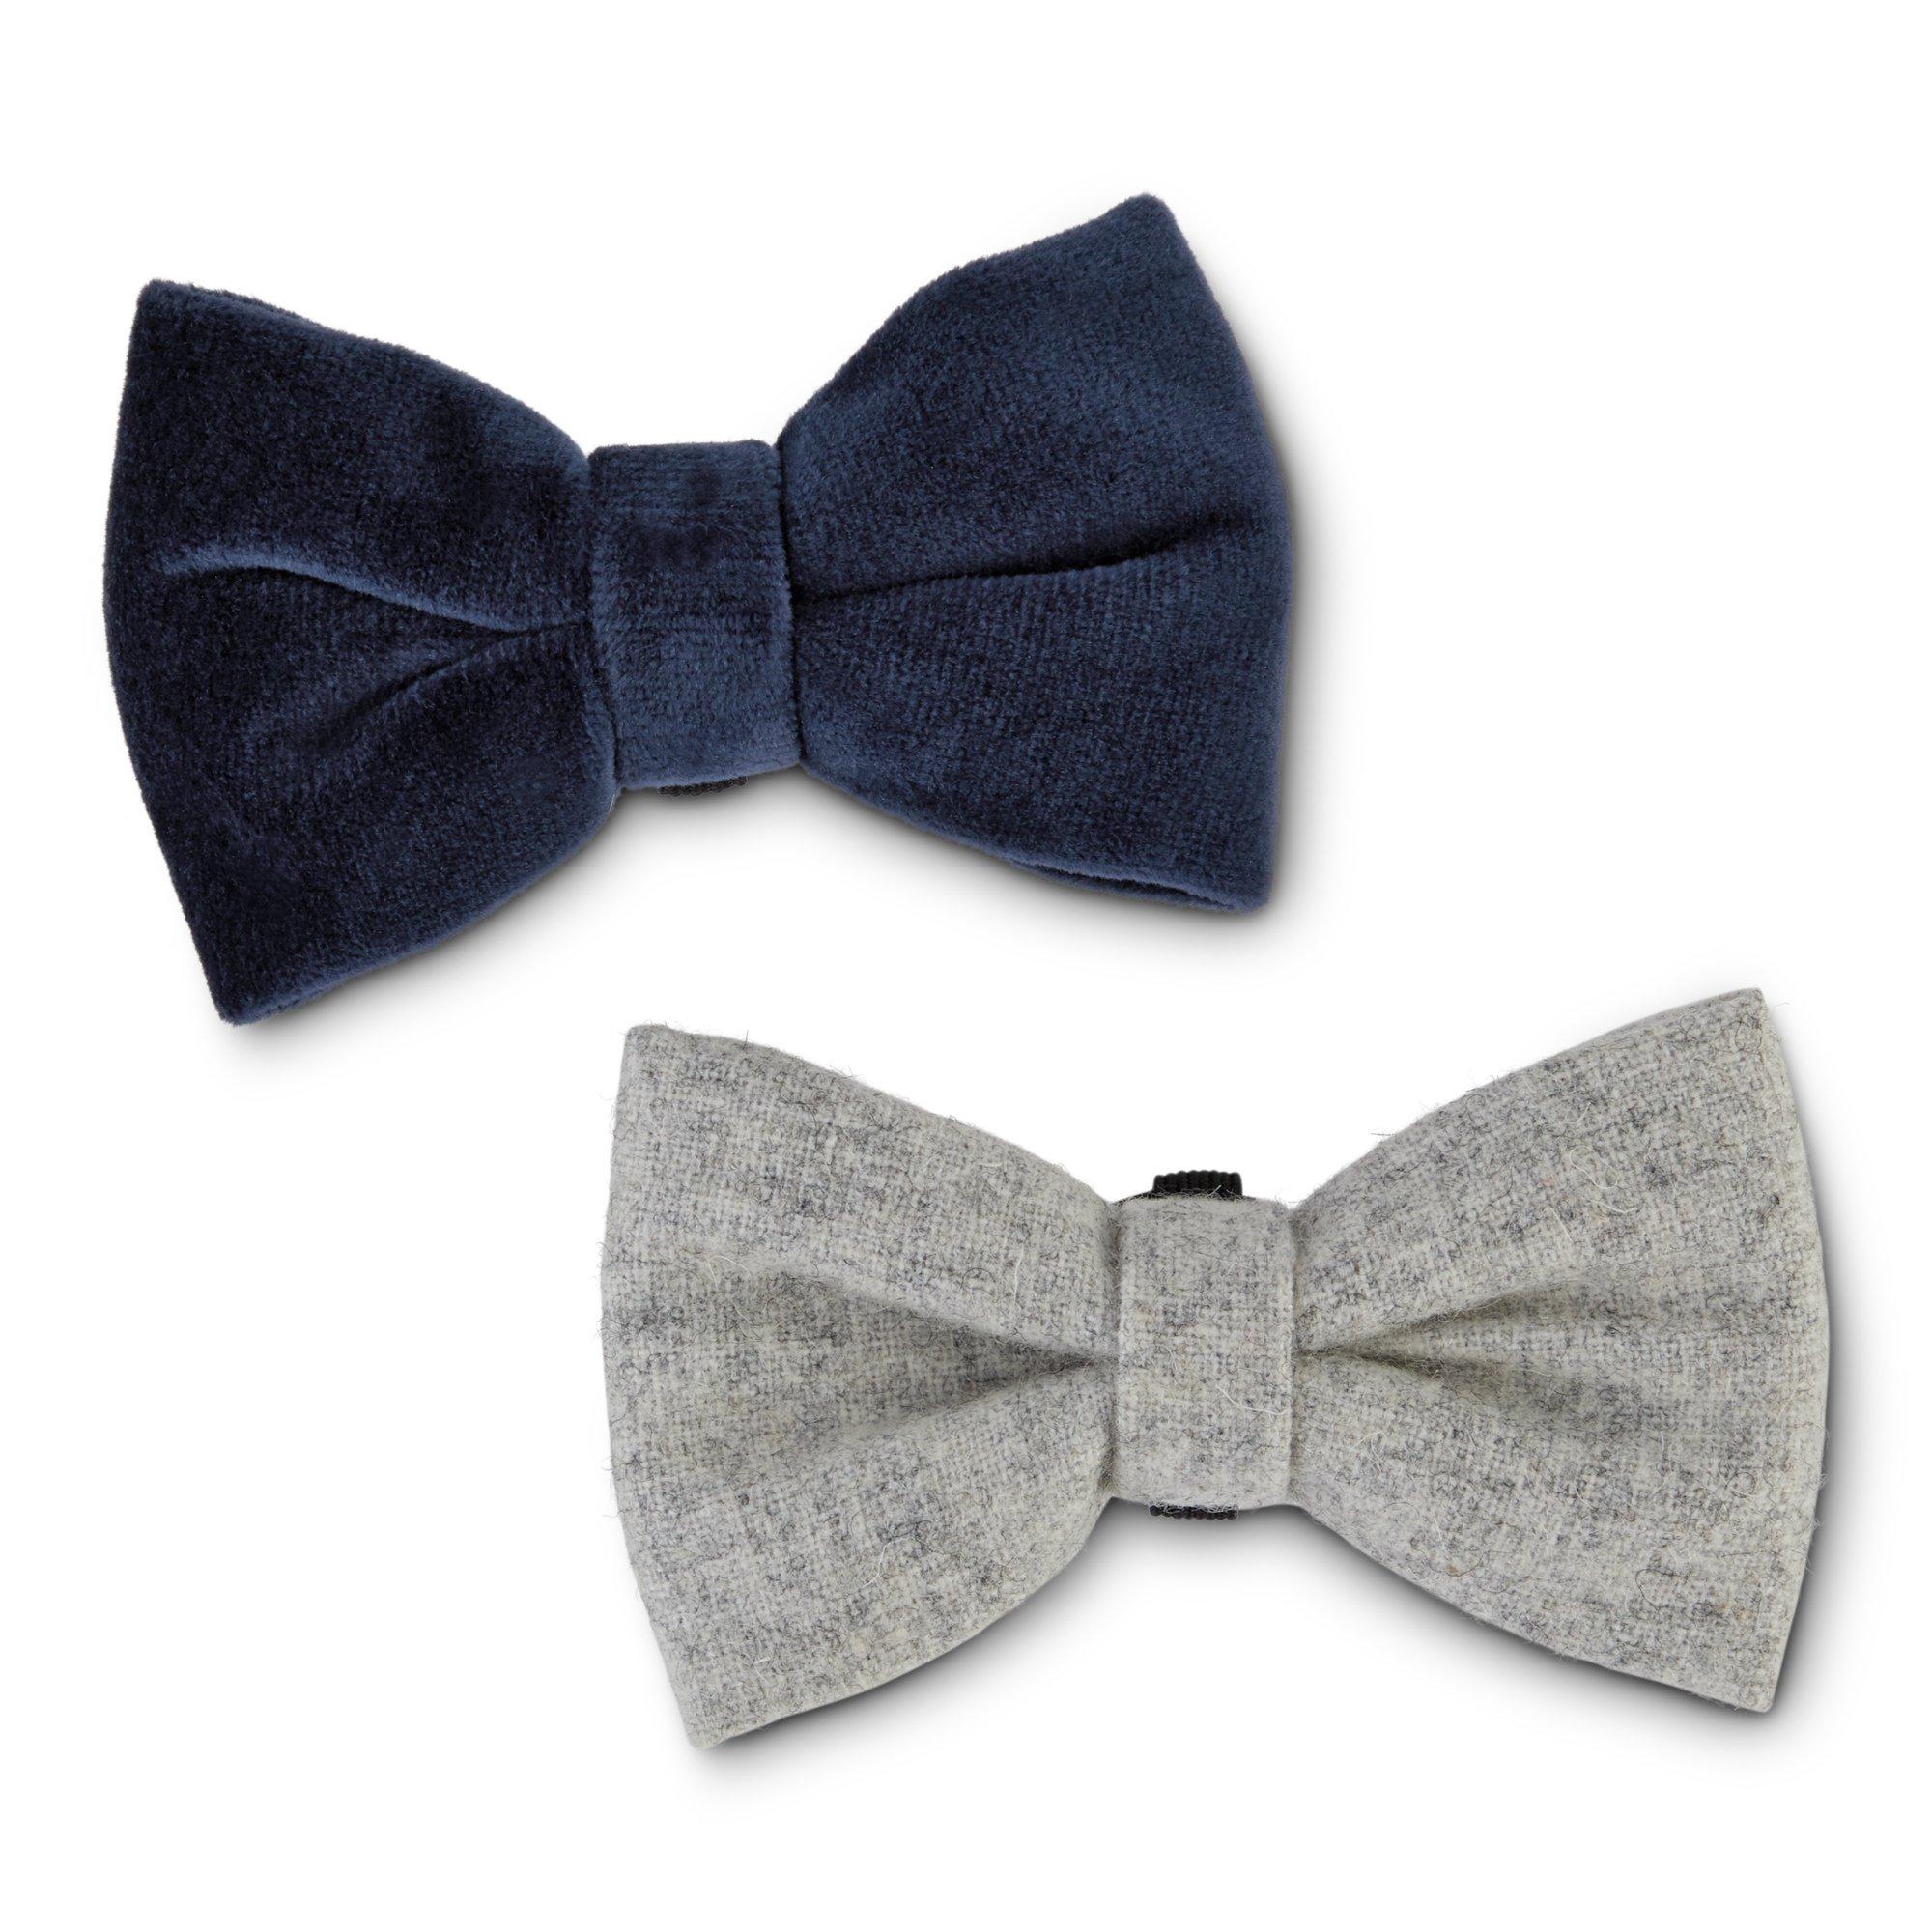 Bond Co Stone Gray And Blue Velvet Dog Bow Tie Set Pack Of 2 Dog Bows Tie Set Blue Velvet